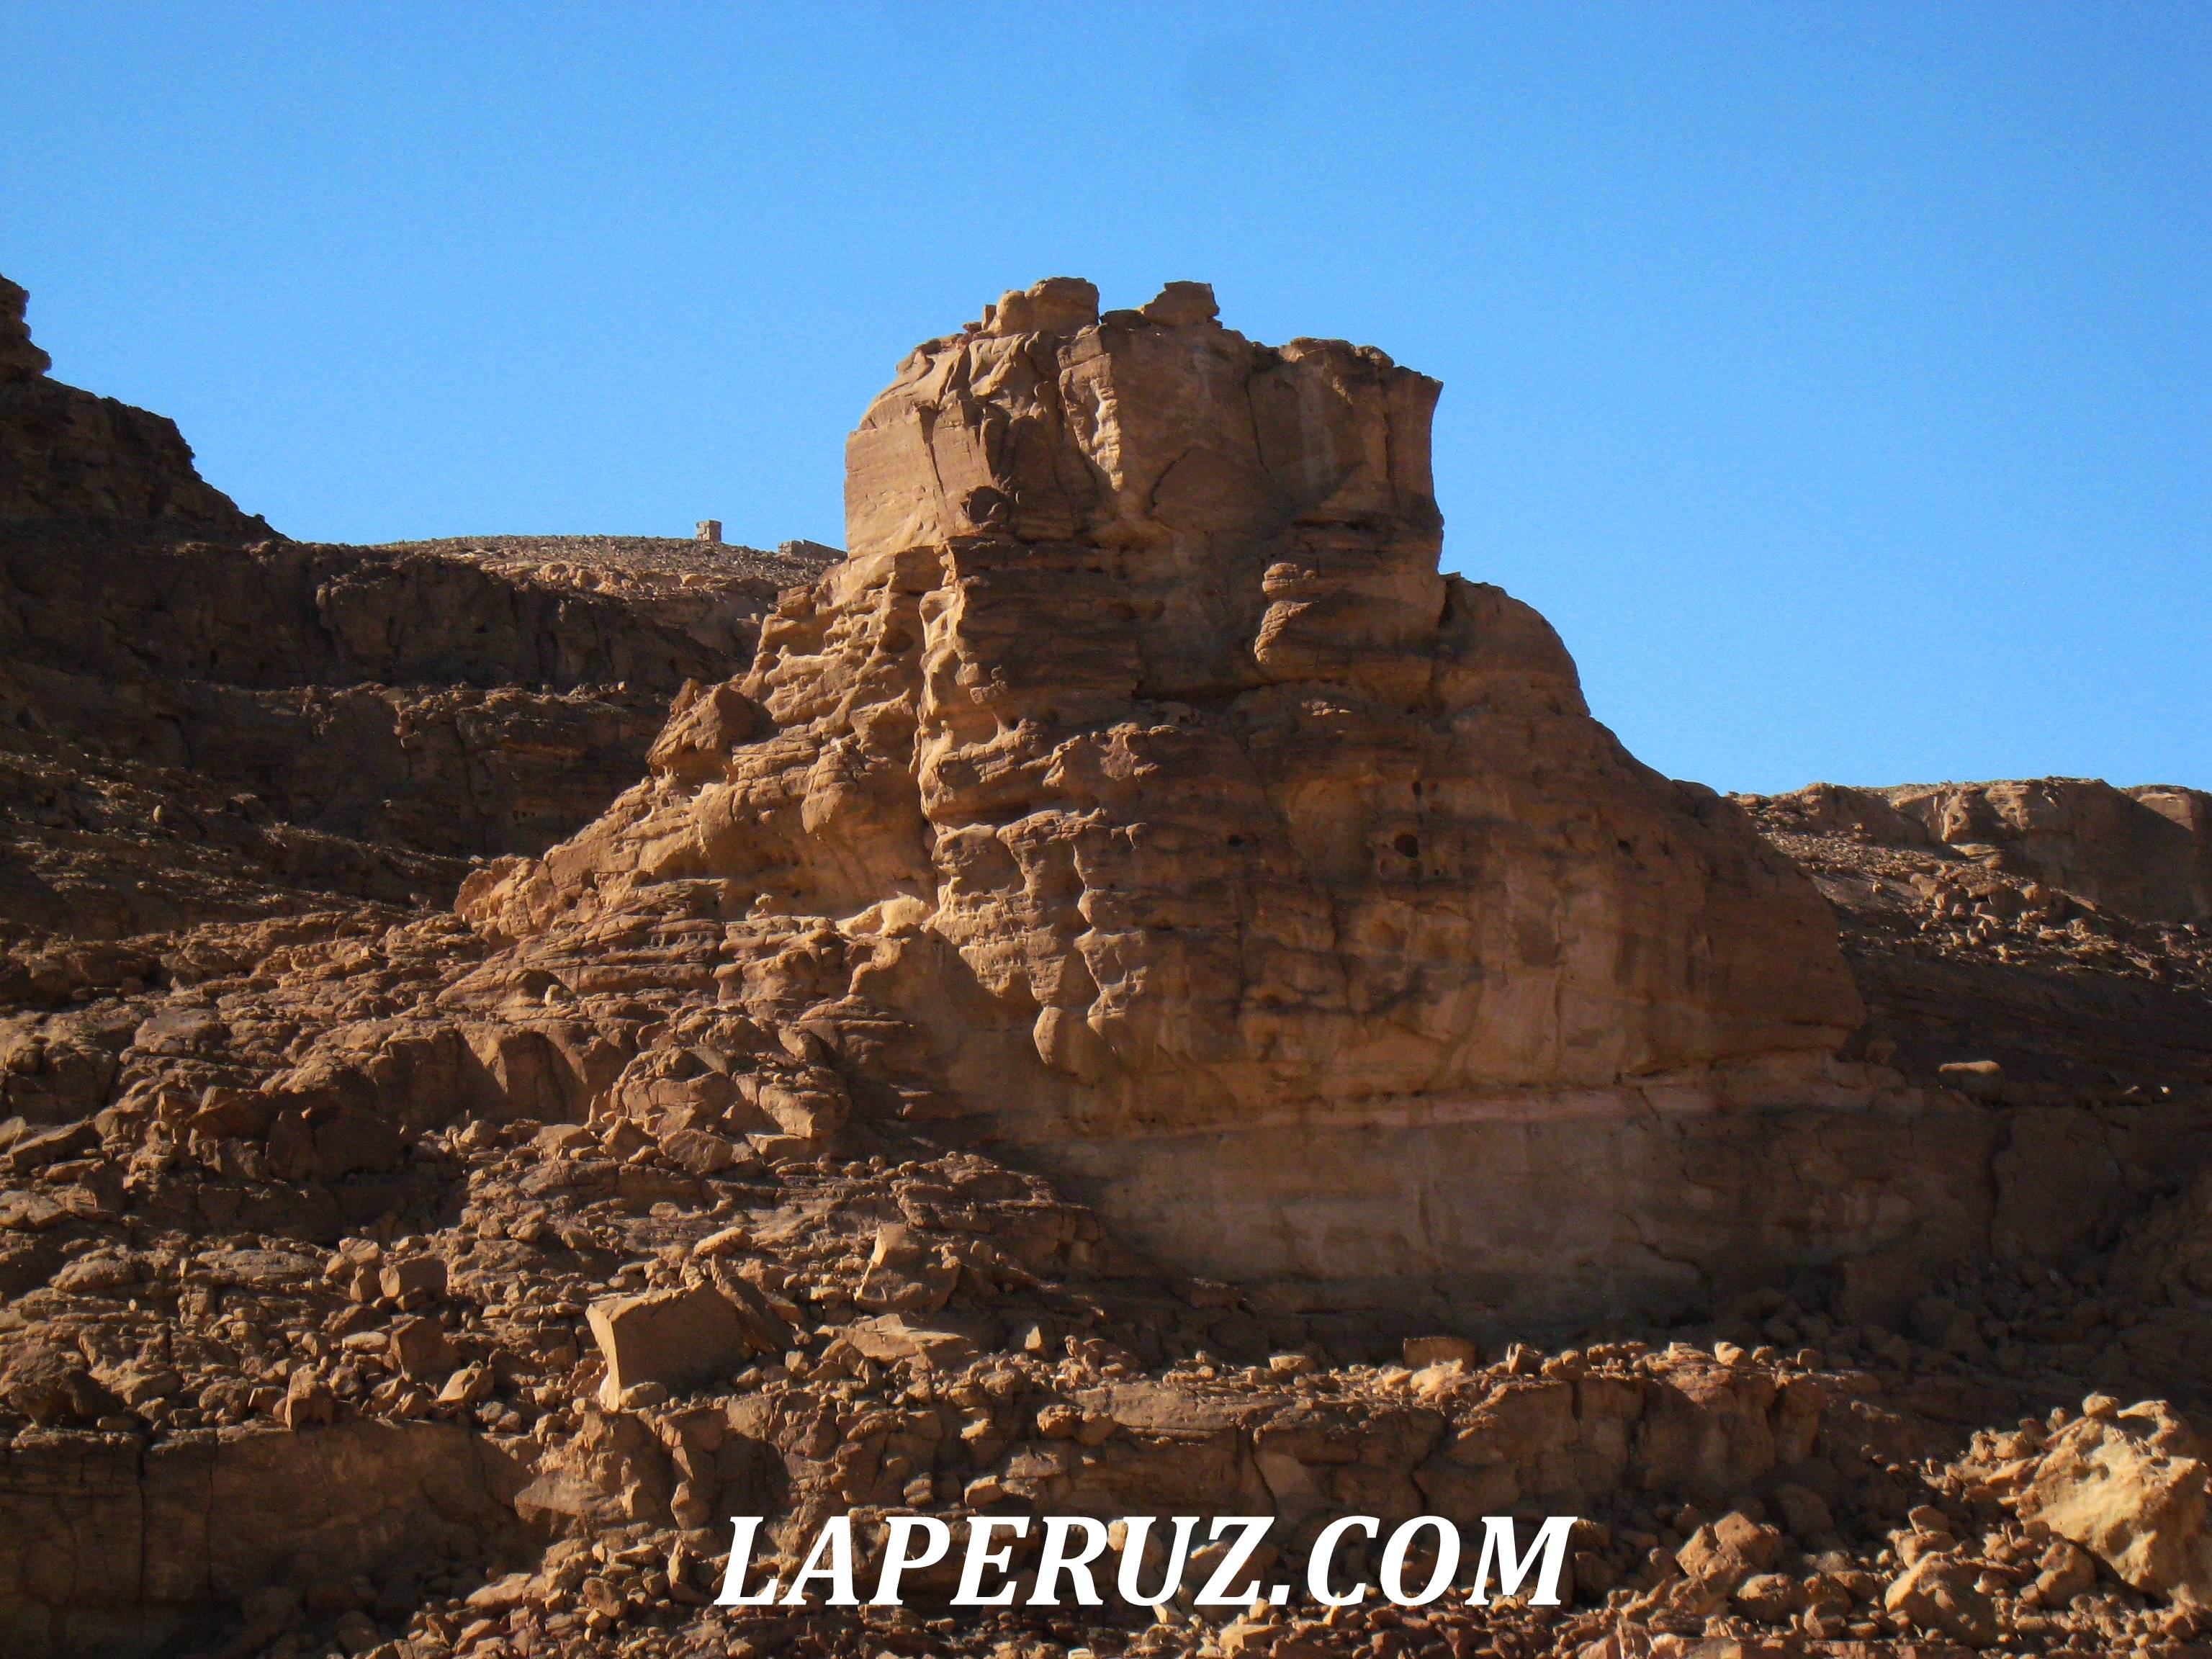 cvetnoi_kanyon_egypt_31